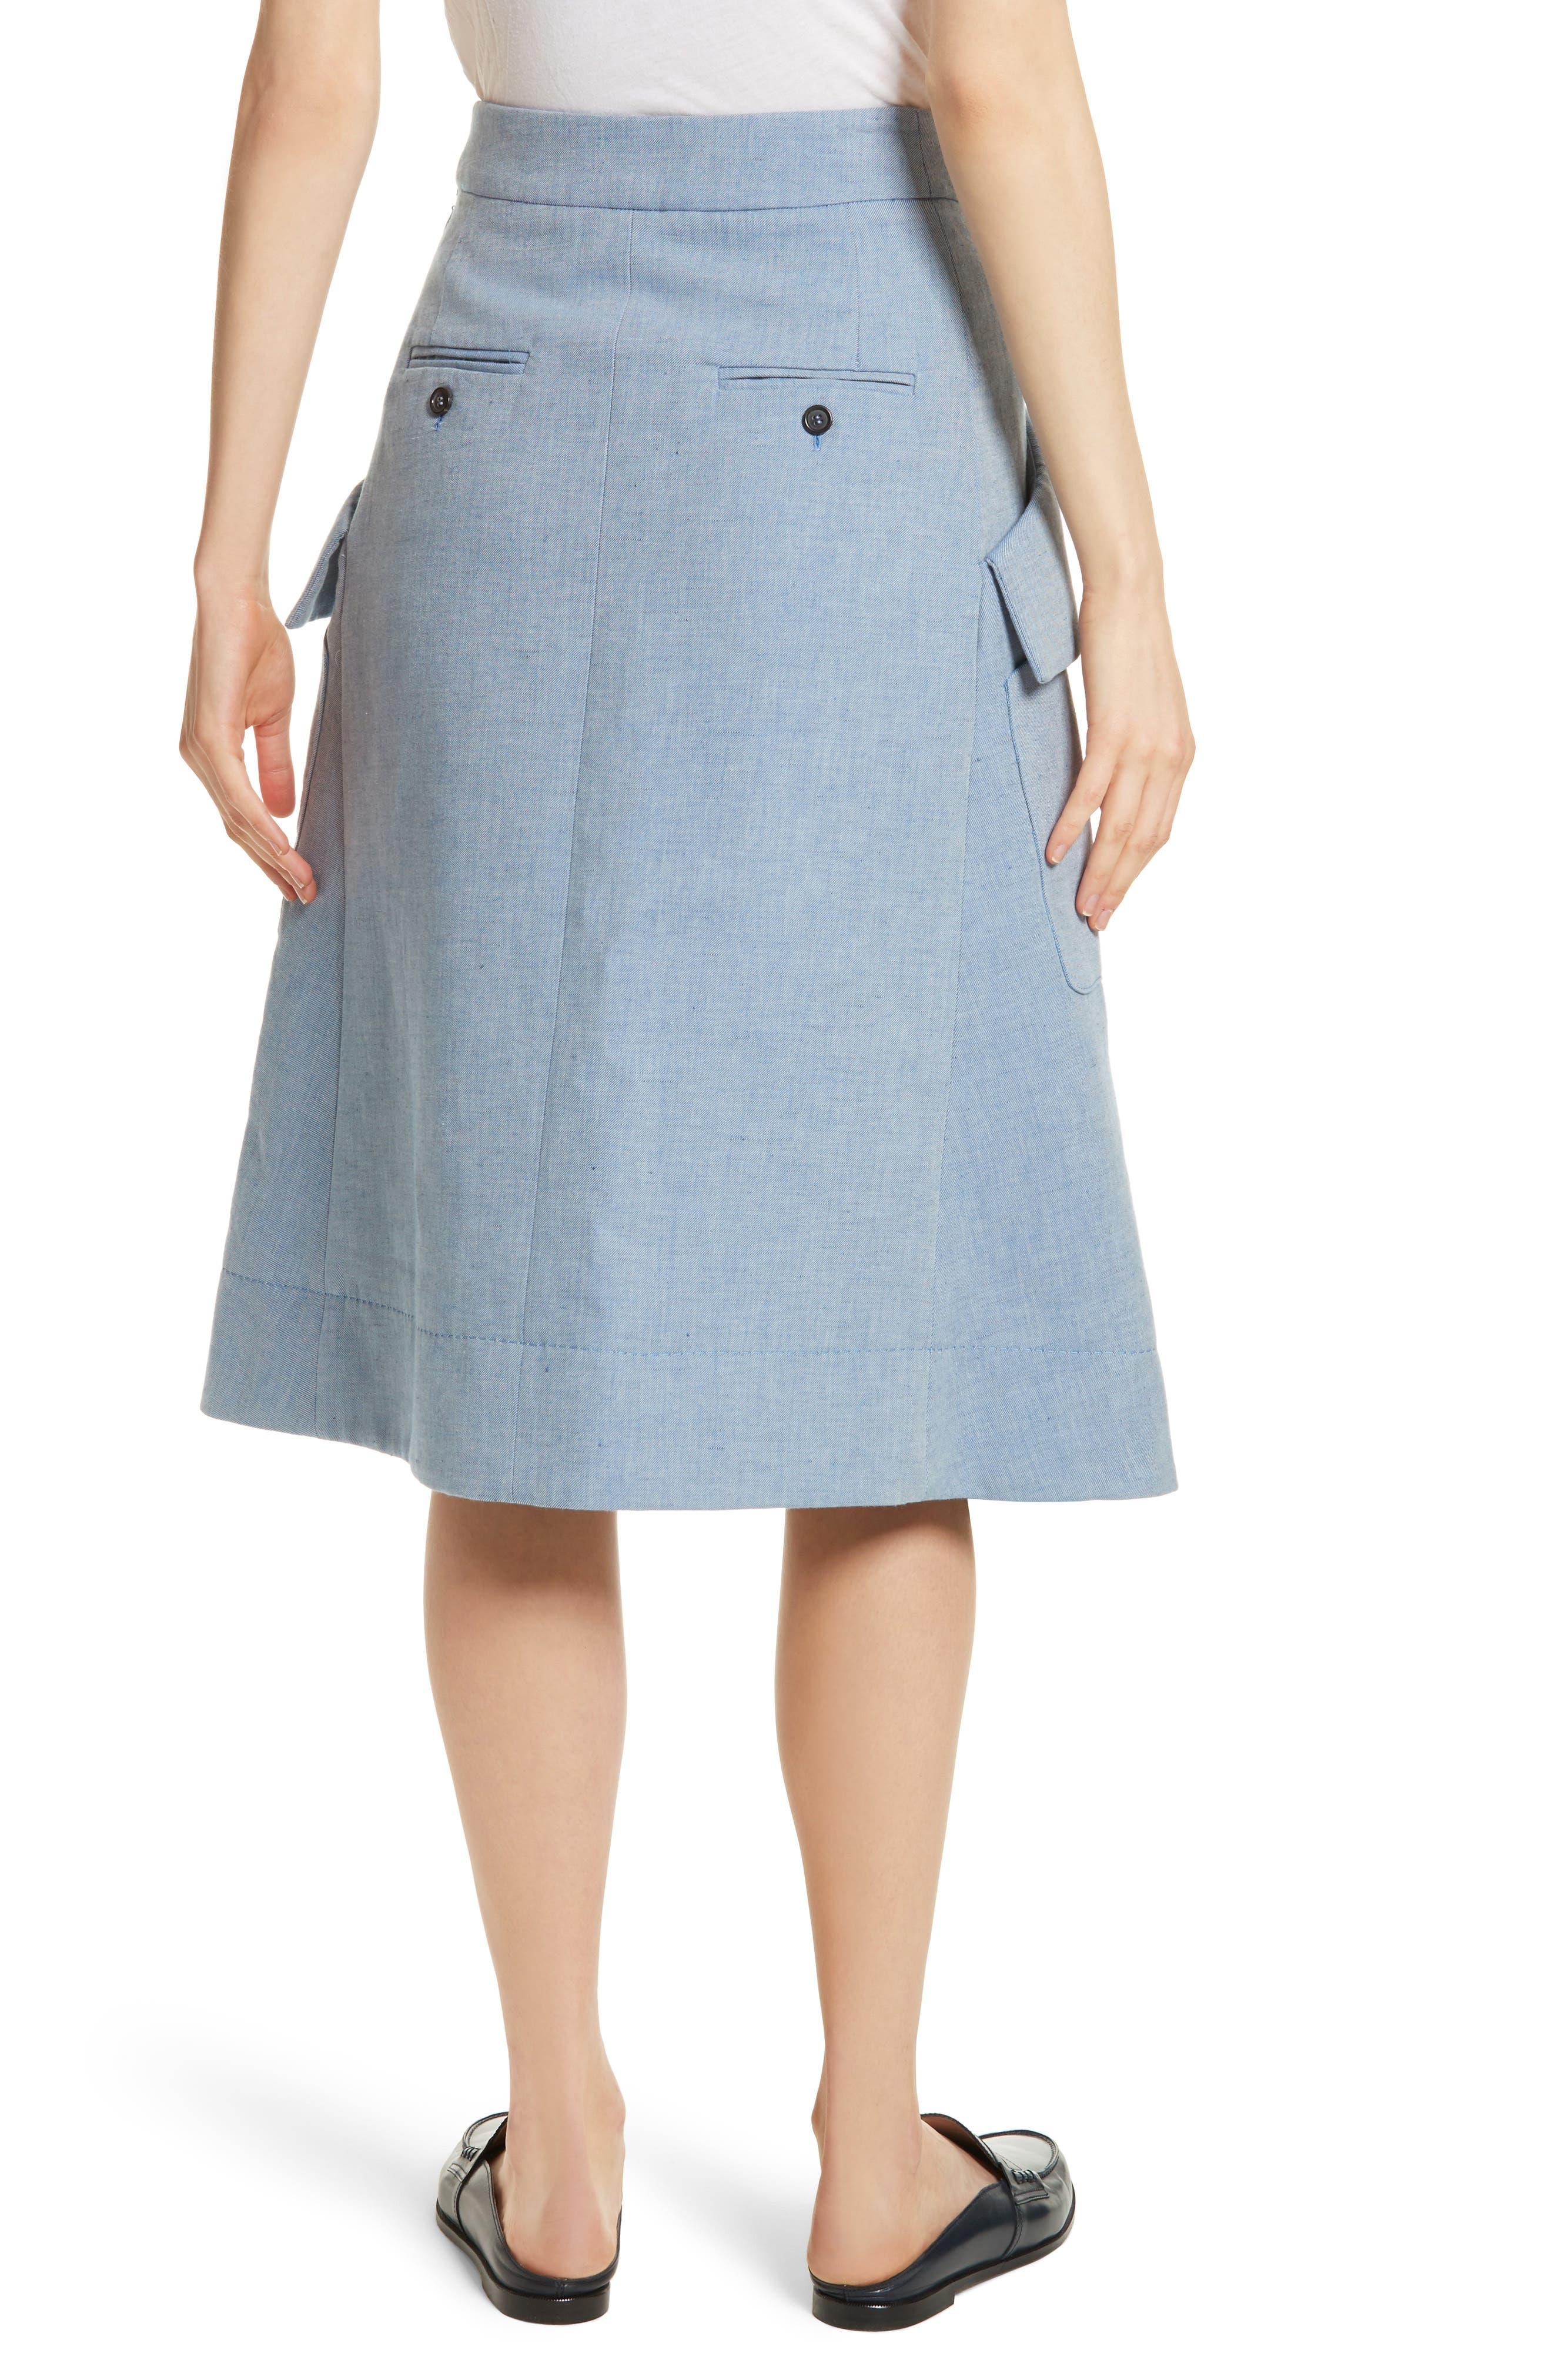 Jupe Genou Skirt,                             Alternate thumbnail 2, color,                             400